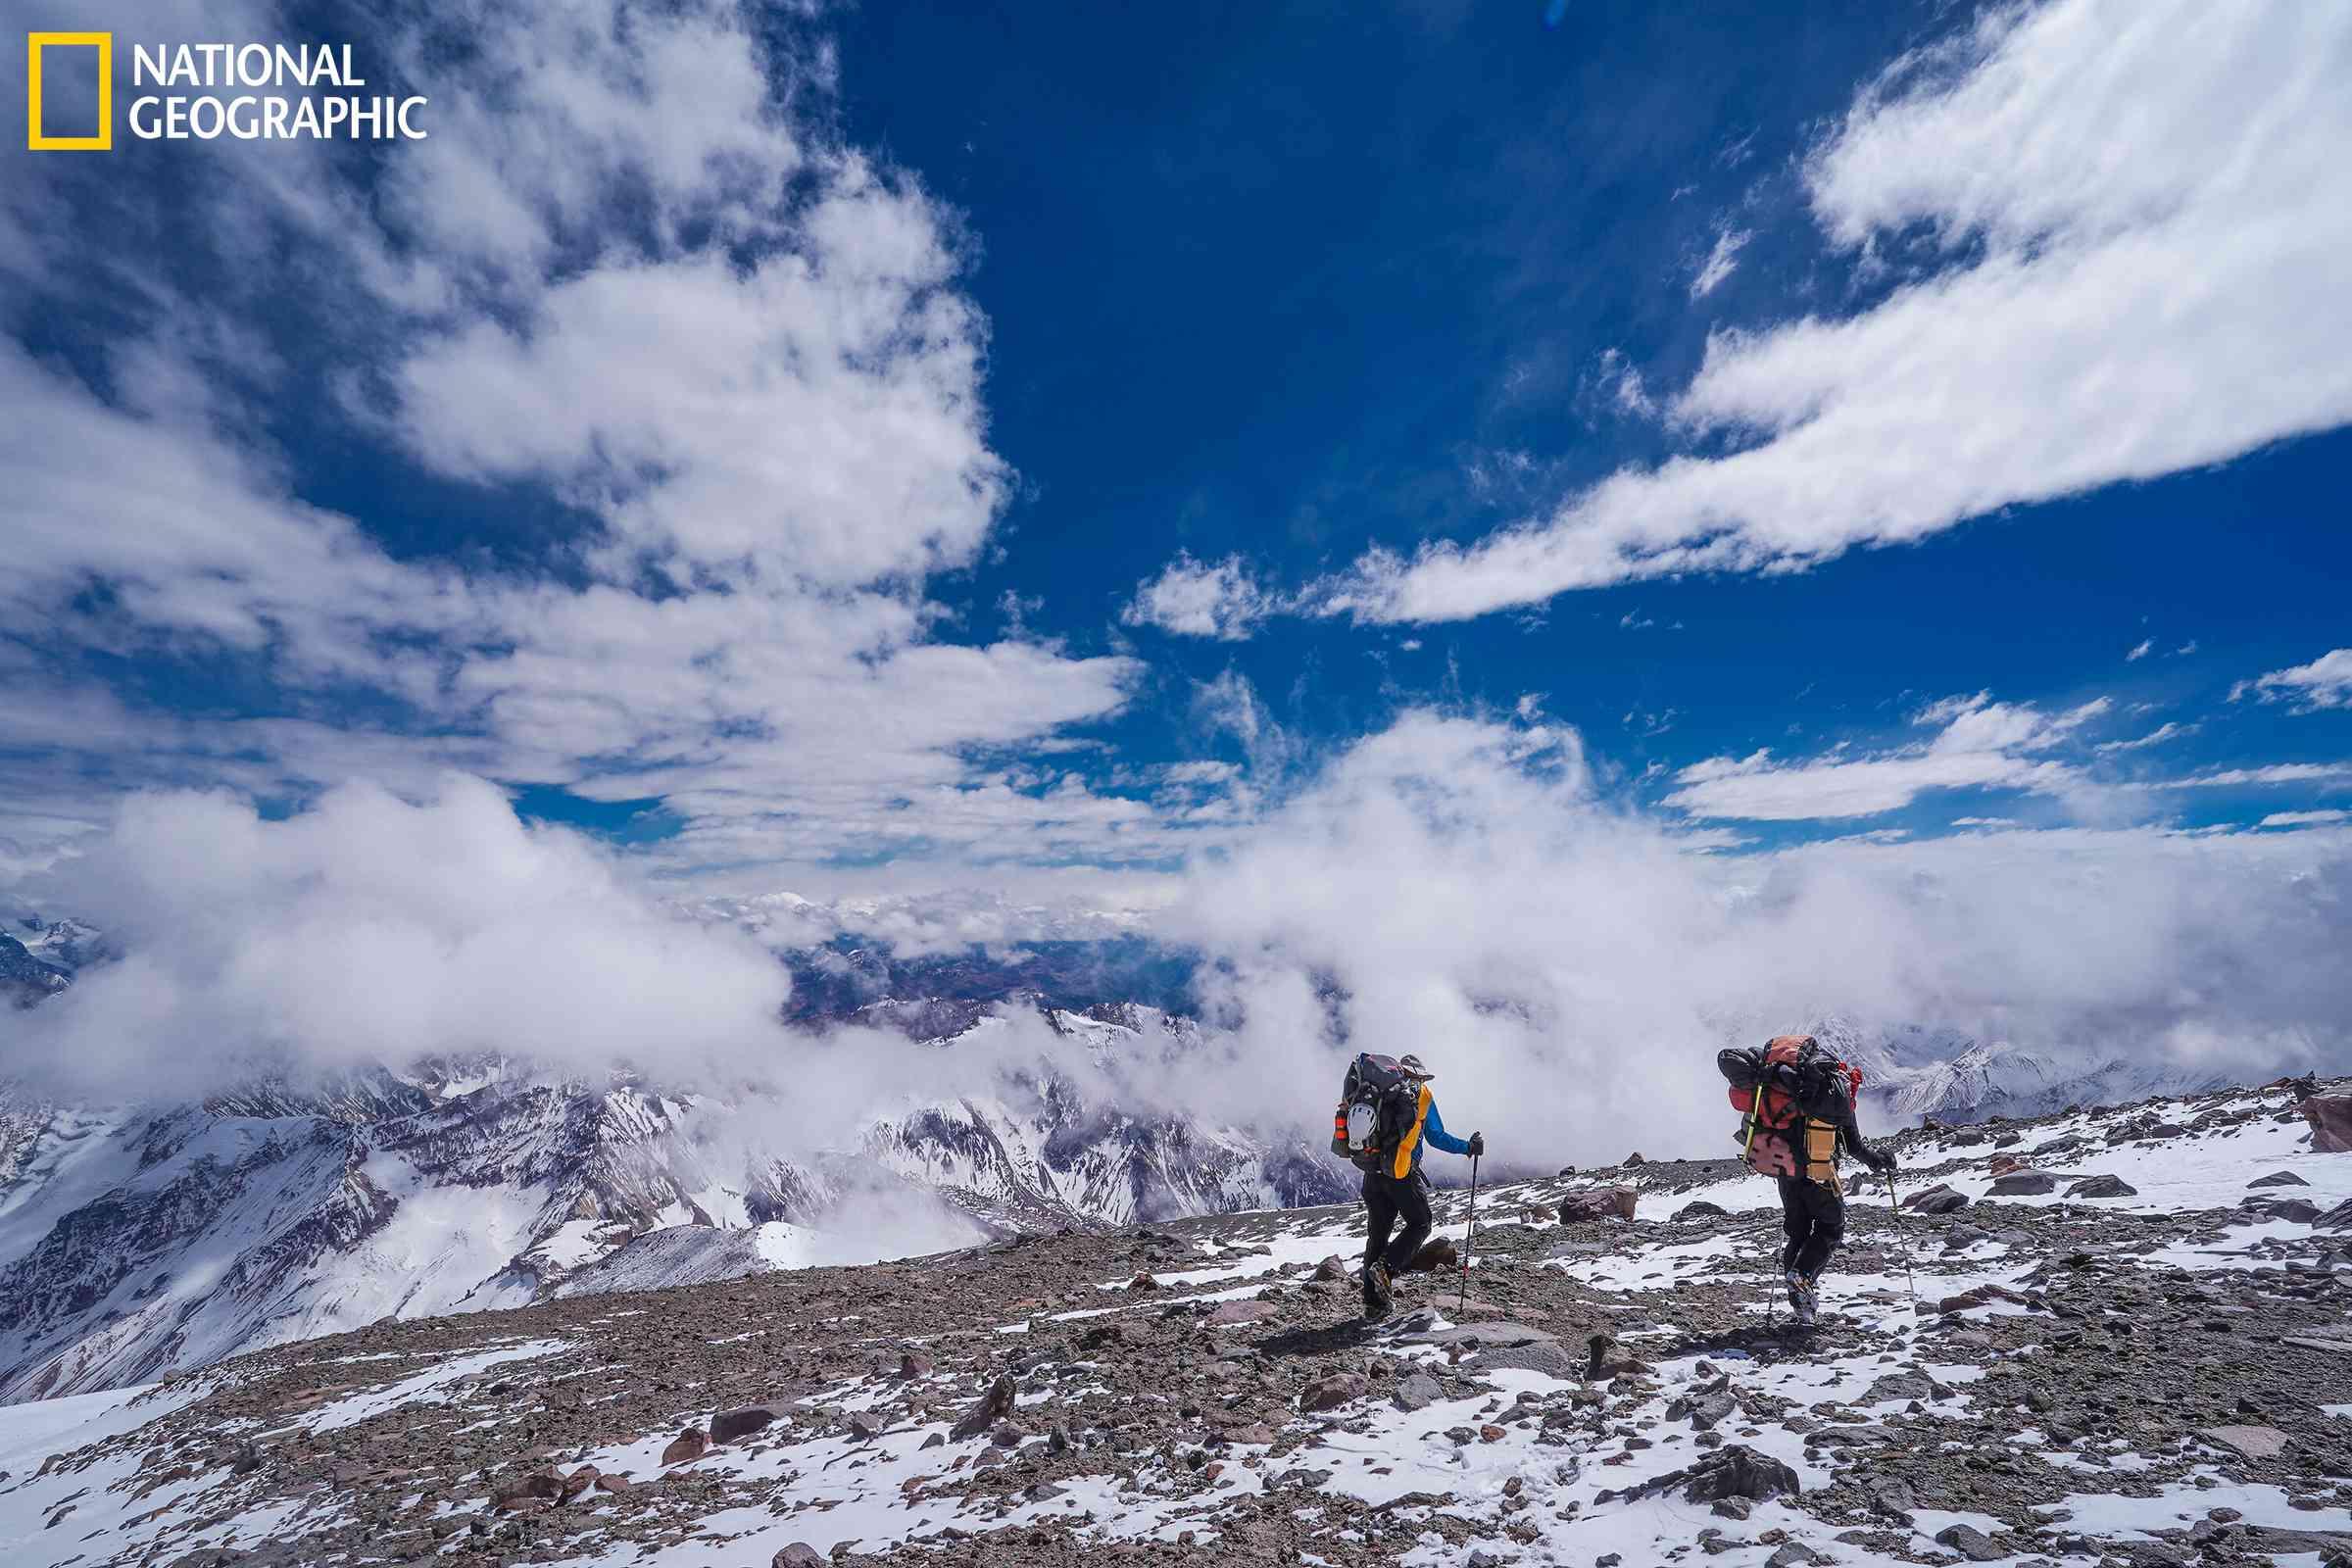 Perry and Gino Casassa, expedition team members, descend Tupungato Volcano